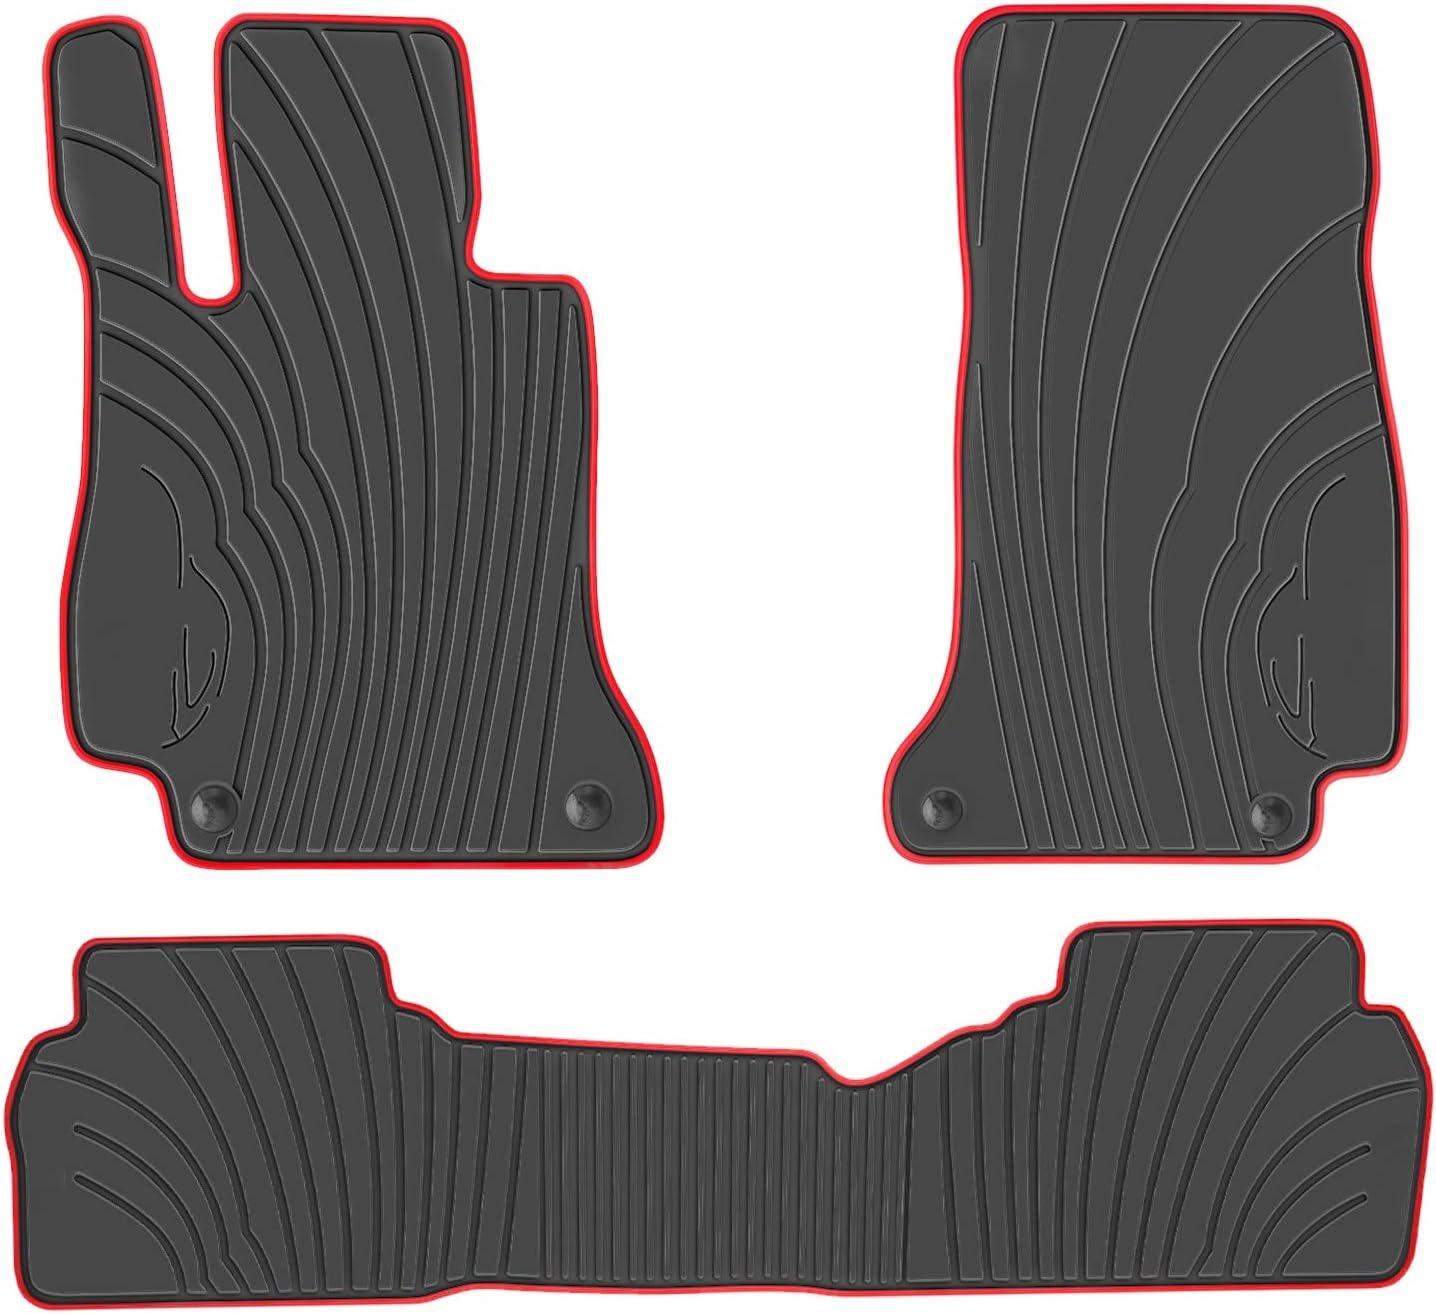 San Auto Car Floor Mat for Mercedes-Benz E-Class 2017 2018 2019 2020 E300 E320 E400 E350 E63 E550 Custom Fit Black Red Rubber Auto Floor Mats Set All Weather Heavy Duty Odorless